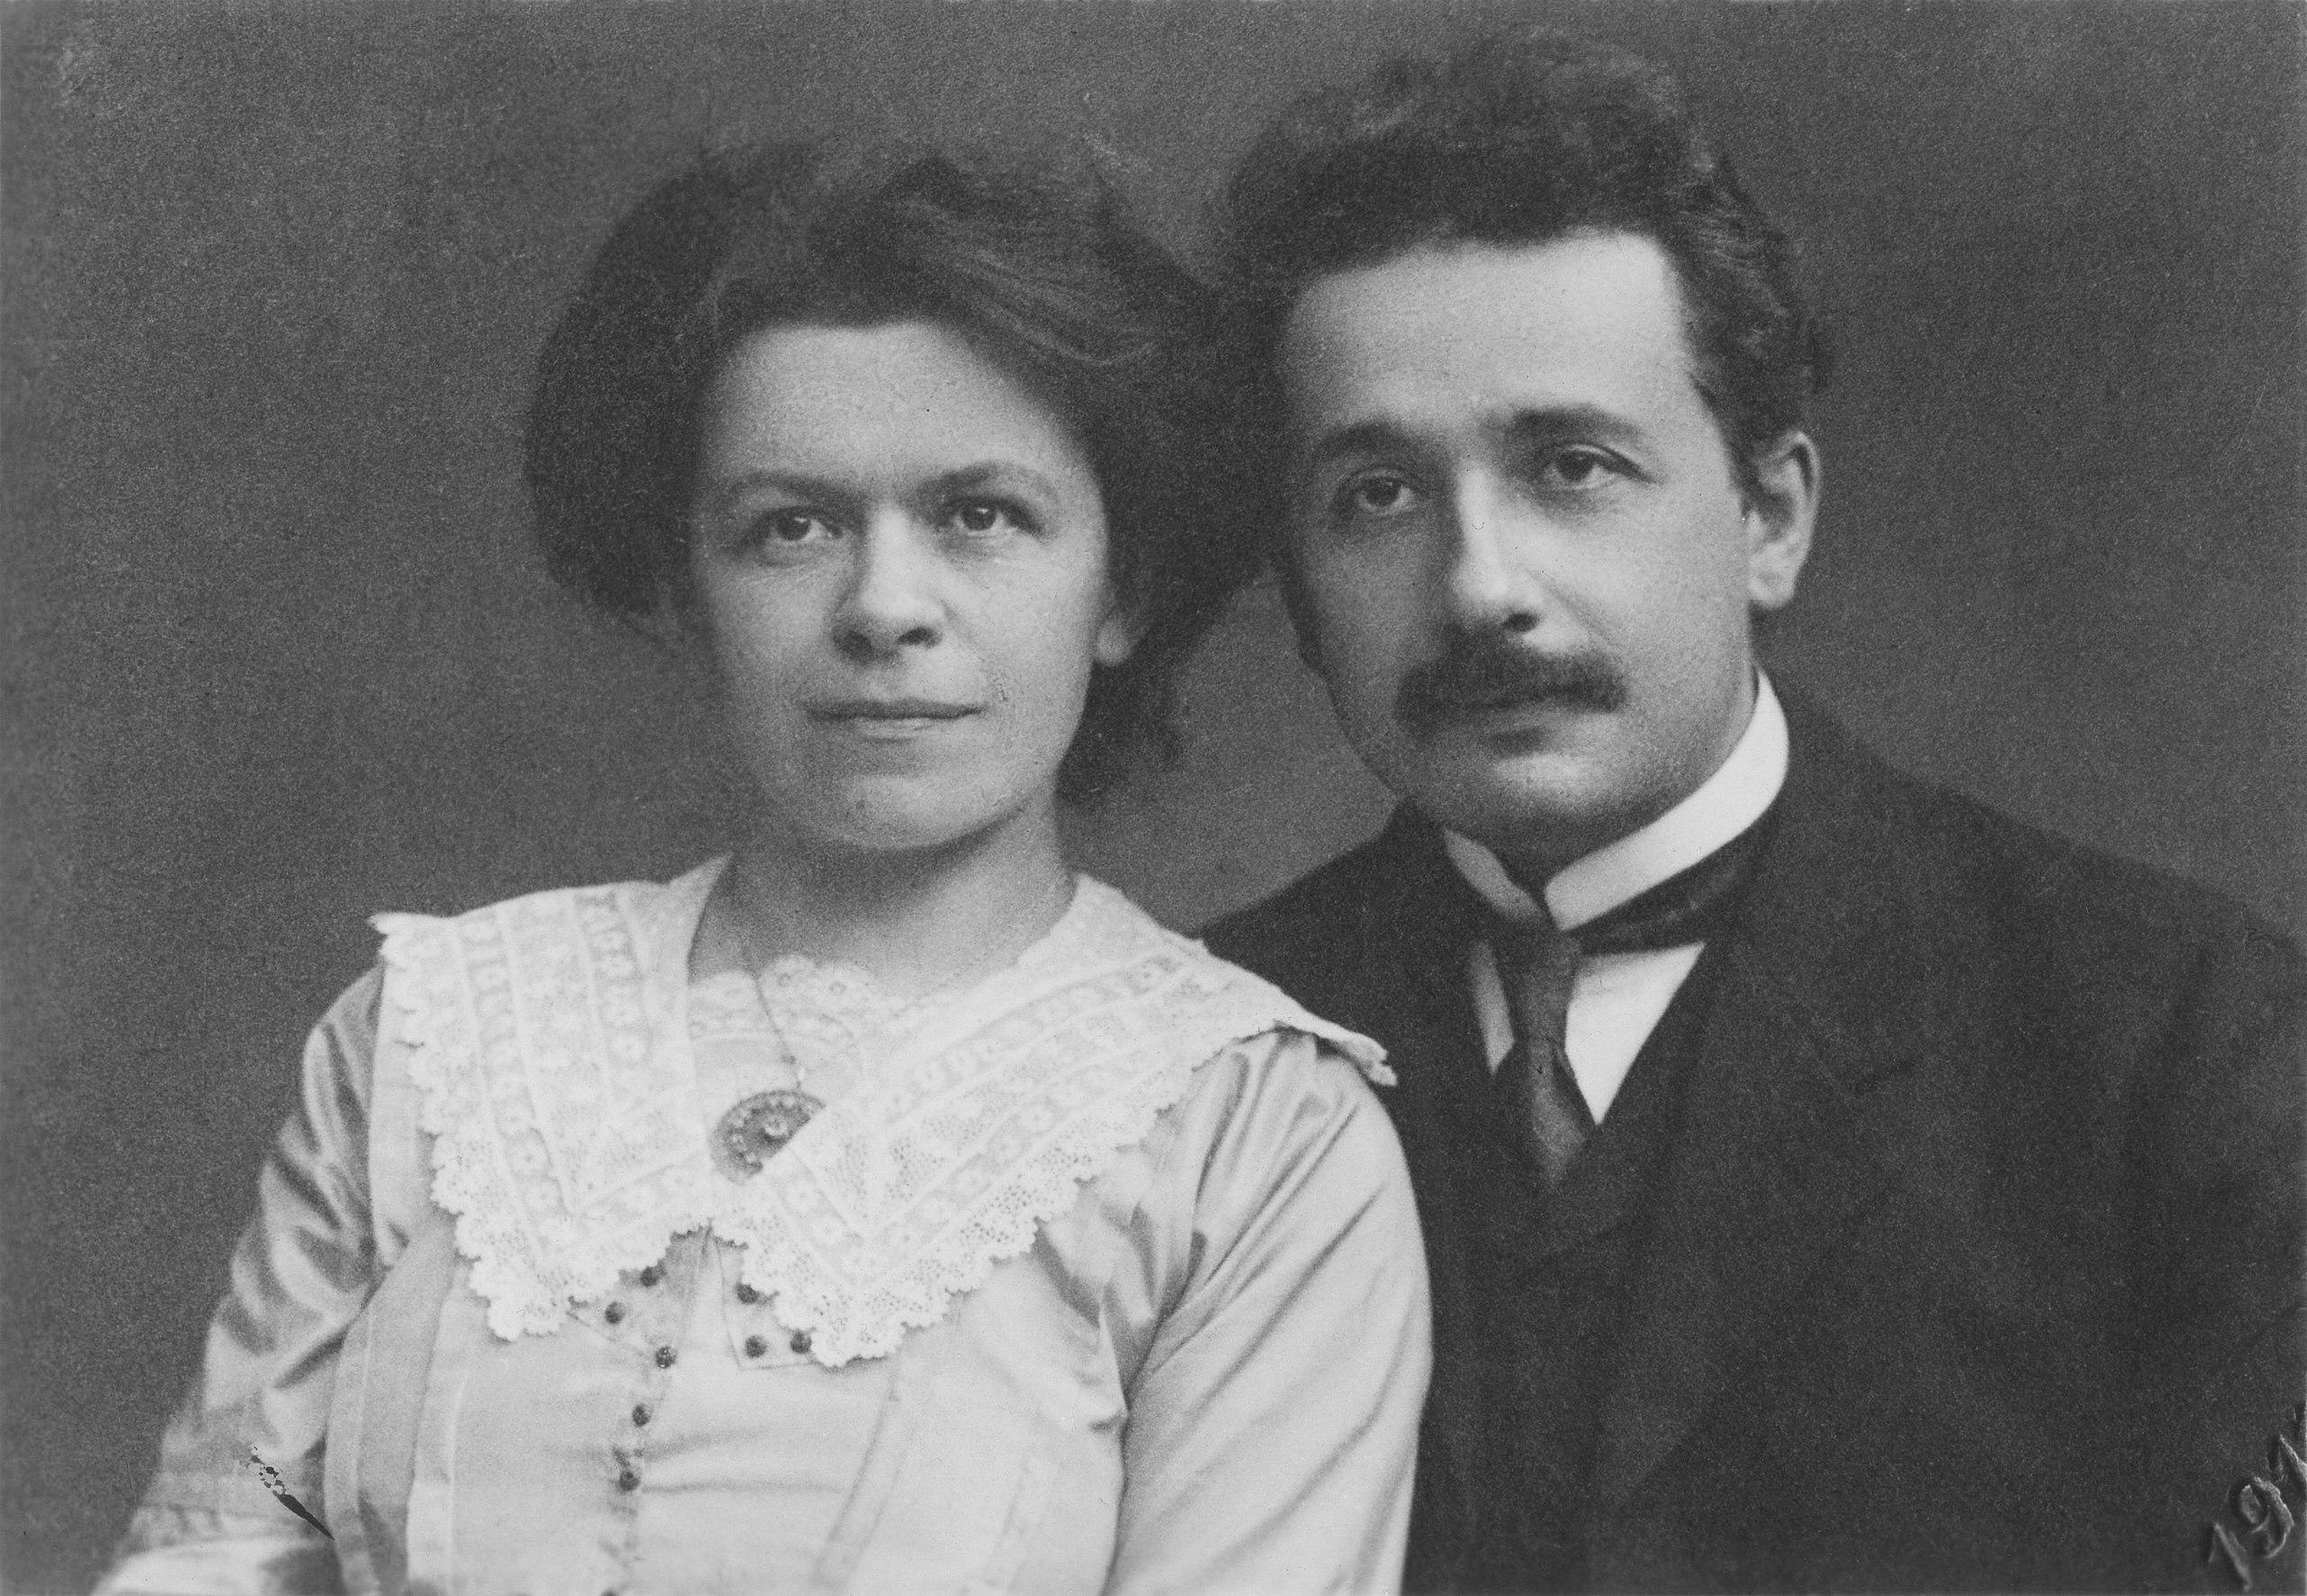 Albert and Mileva Einstein, 1912